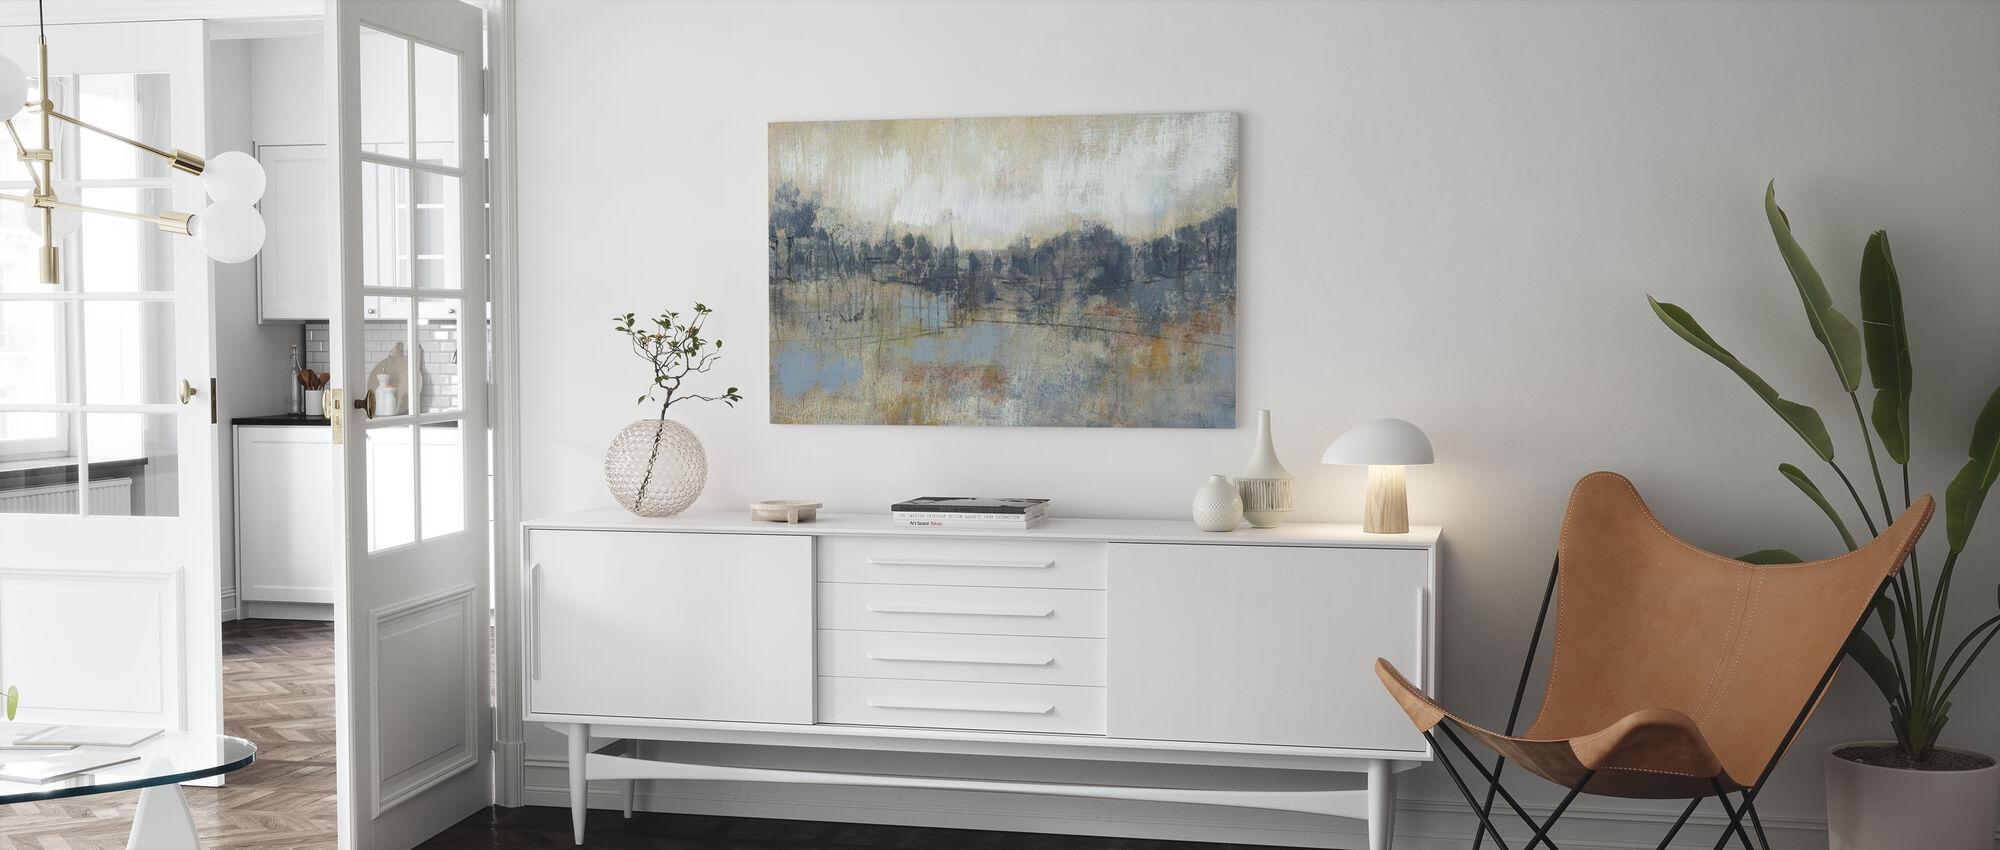 Horizon grigio freddo - Stampa su tela - Salotto